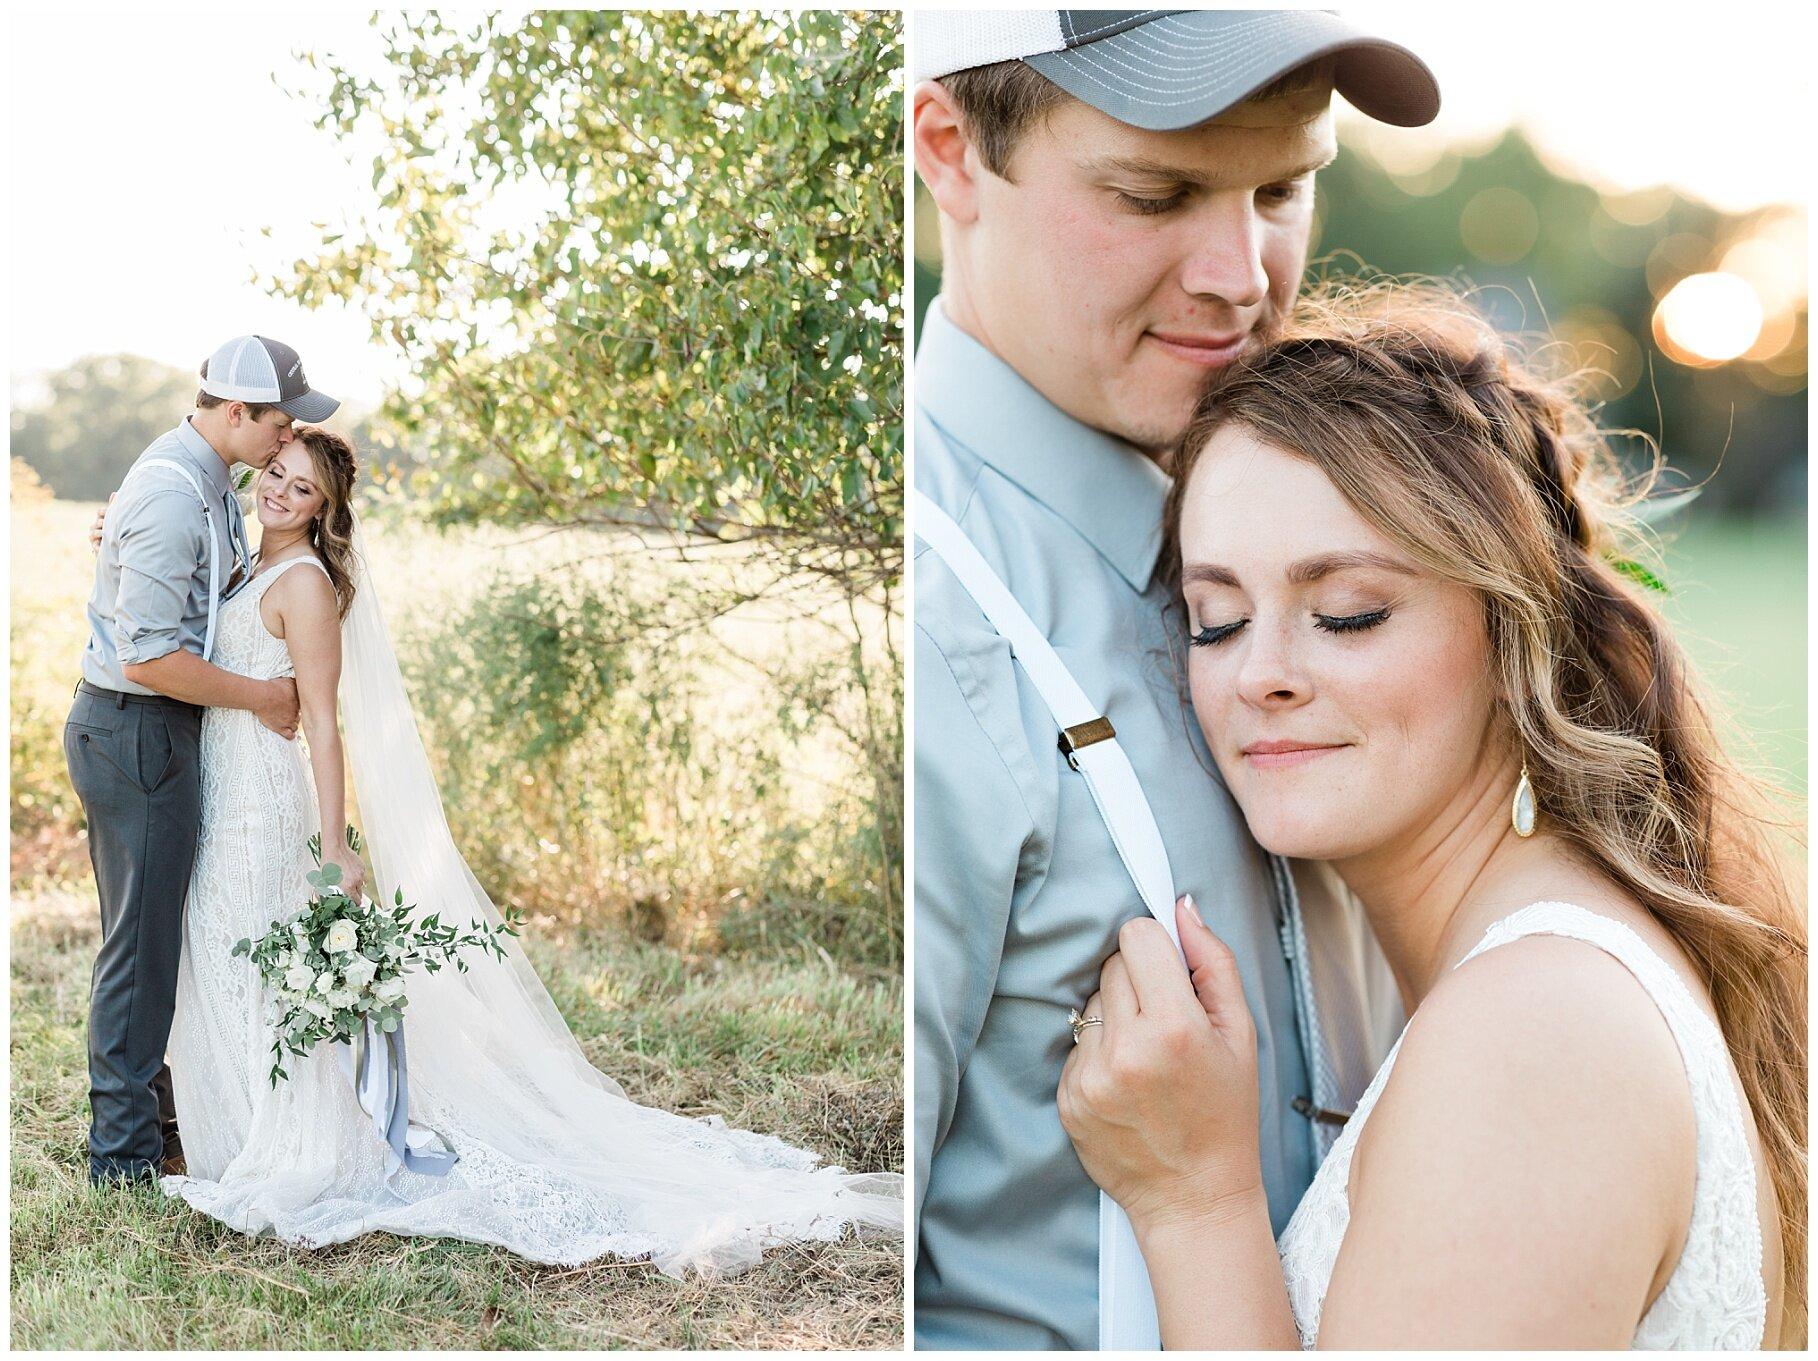 Earth-Toned Wedding by KKP Associate Wedding Photographer and Kelsi Kliethermes Photography Best Columbia Missouri Wedding Photographer_0035.jpg